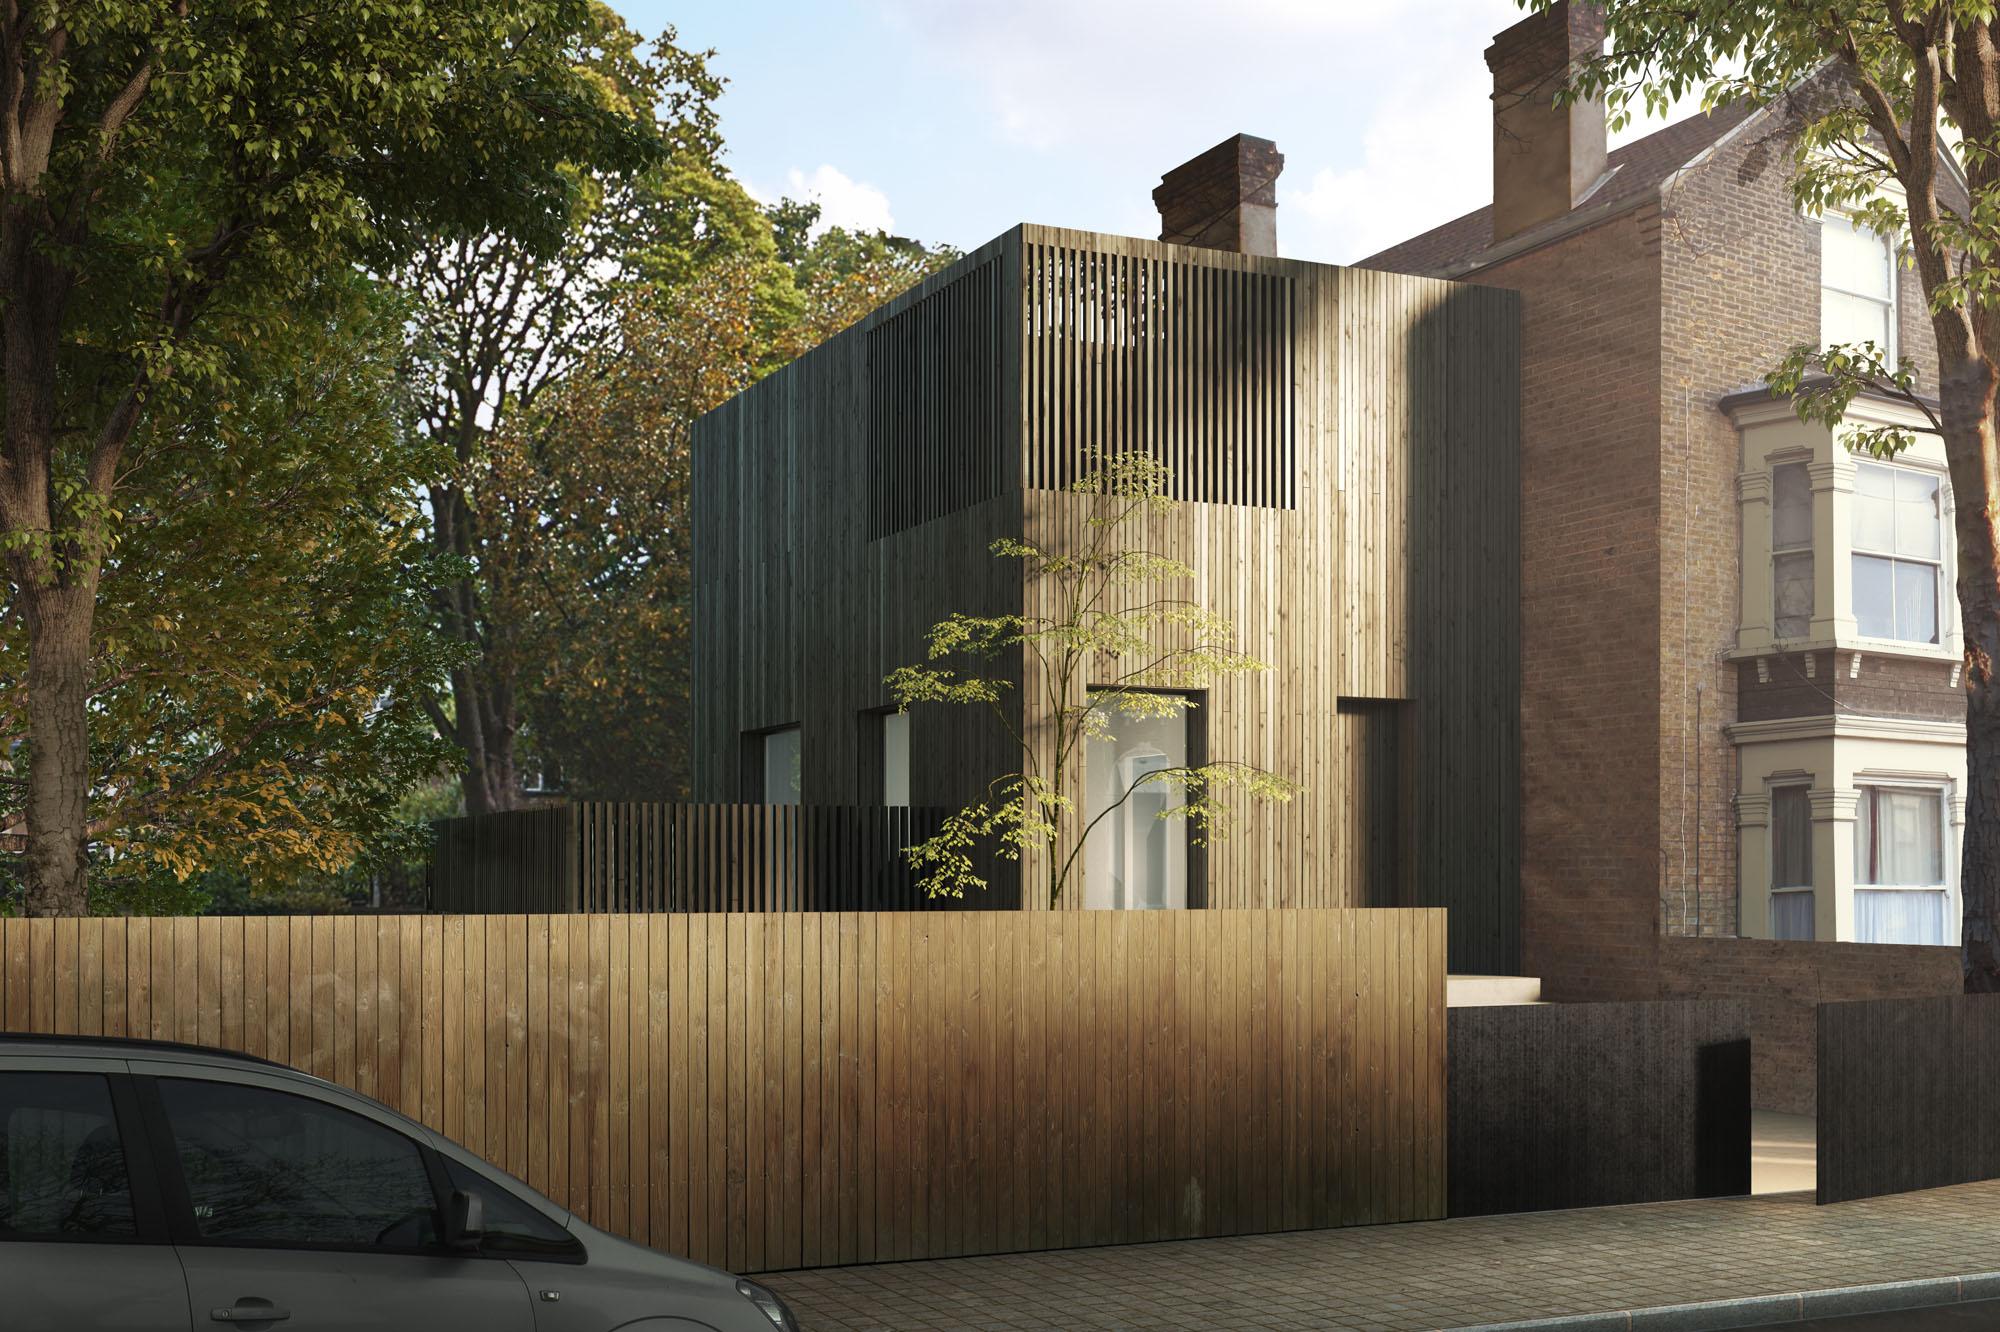 cube-haus-adjaye-associates-architects-cs-2000px-01